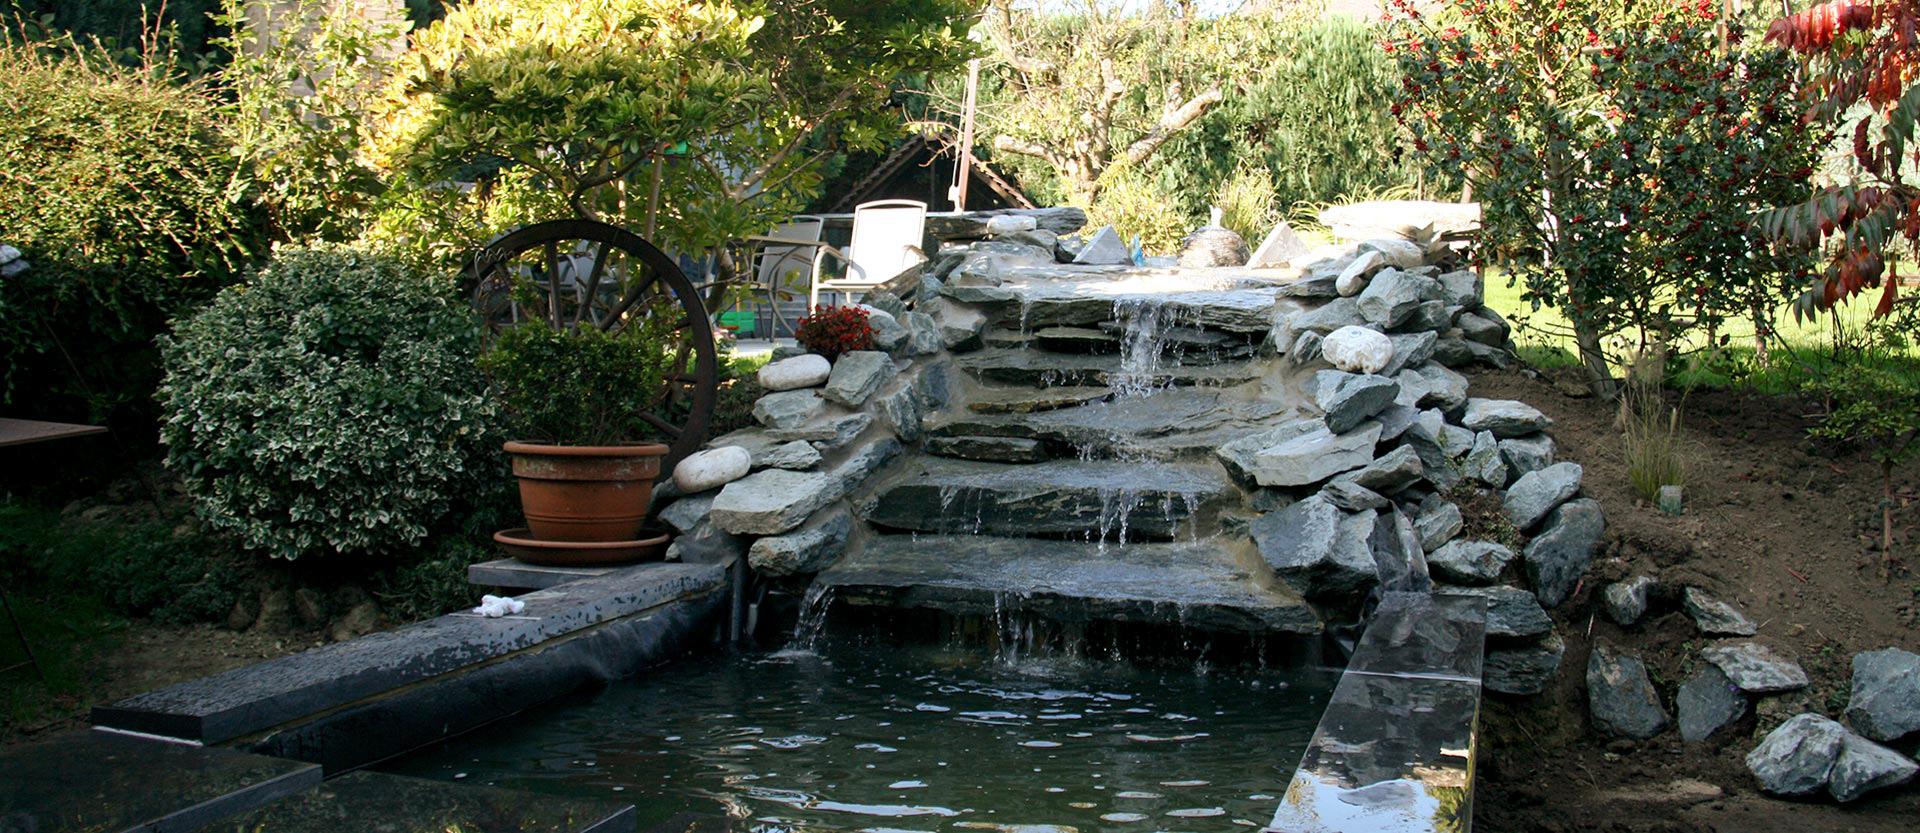 D senvasement r alisation piscine naturelle am nagement for Entretien jardin hainaut